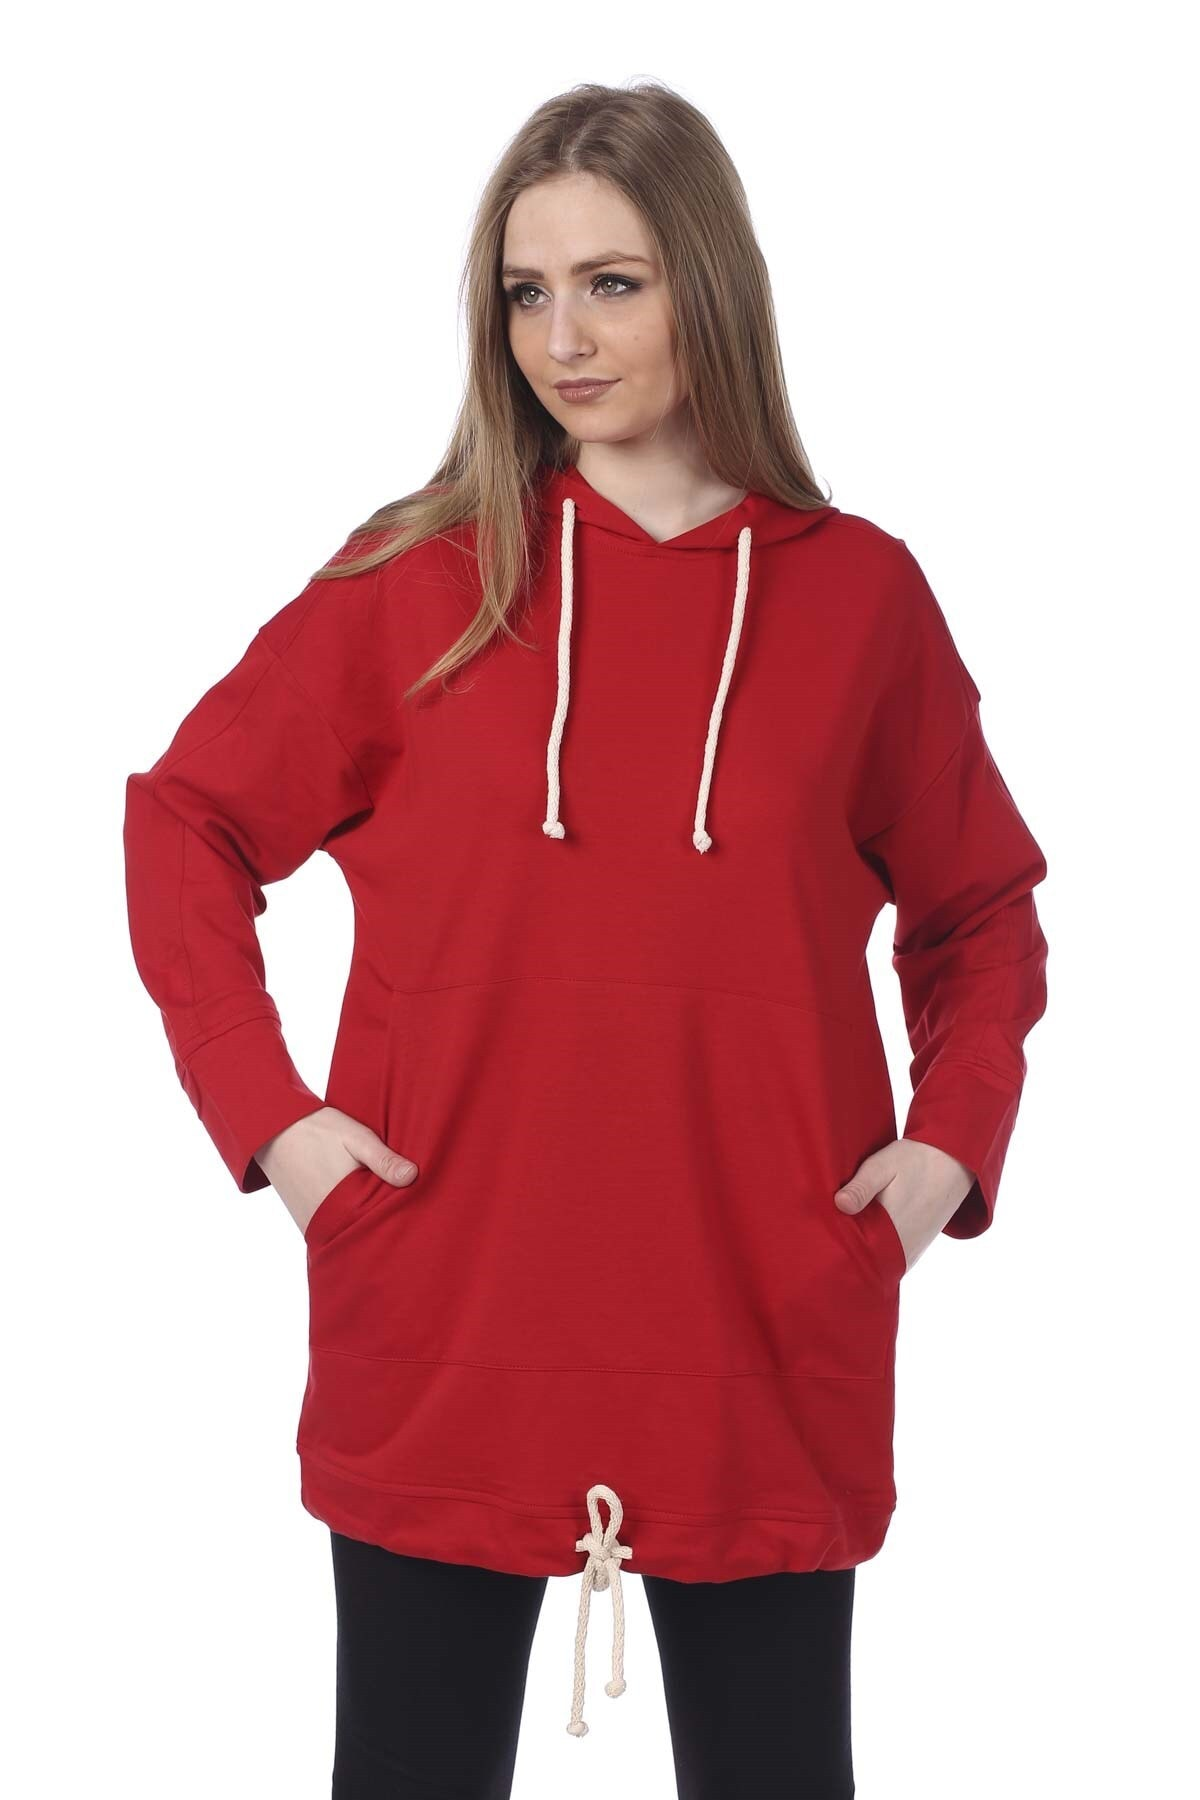 BARRELS AND OIL Kadın Kırmızı Kapüşonlu Kanguru Cepli Sweatshirt 733-19K014.16